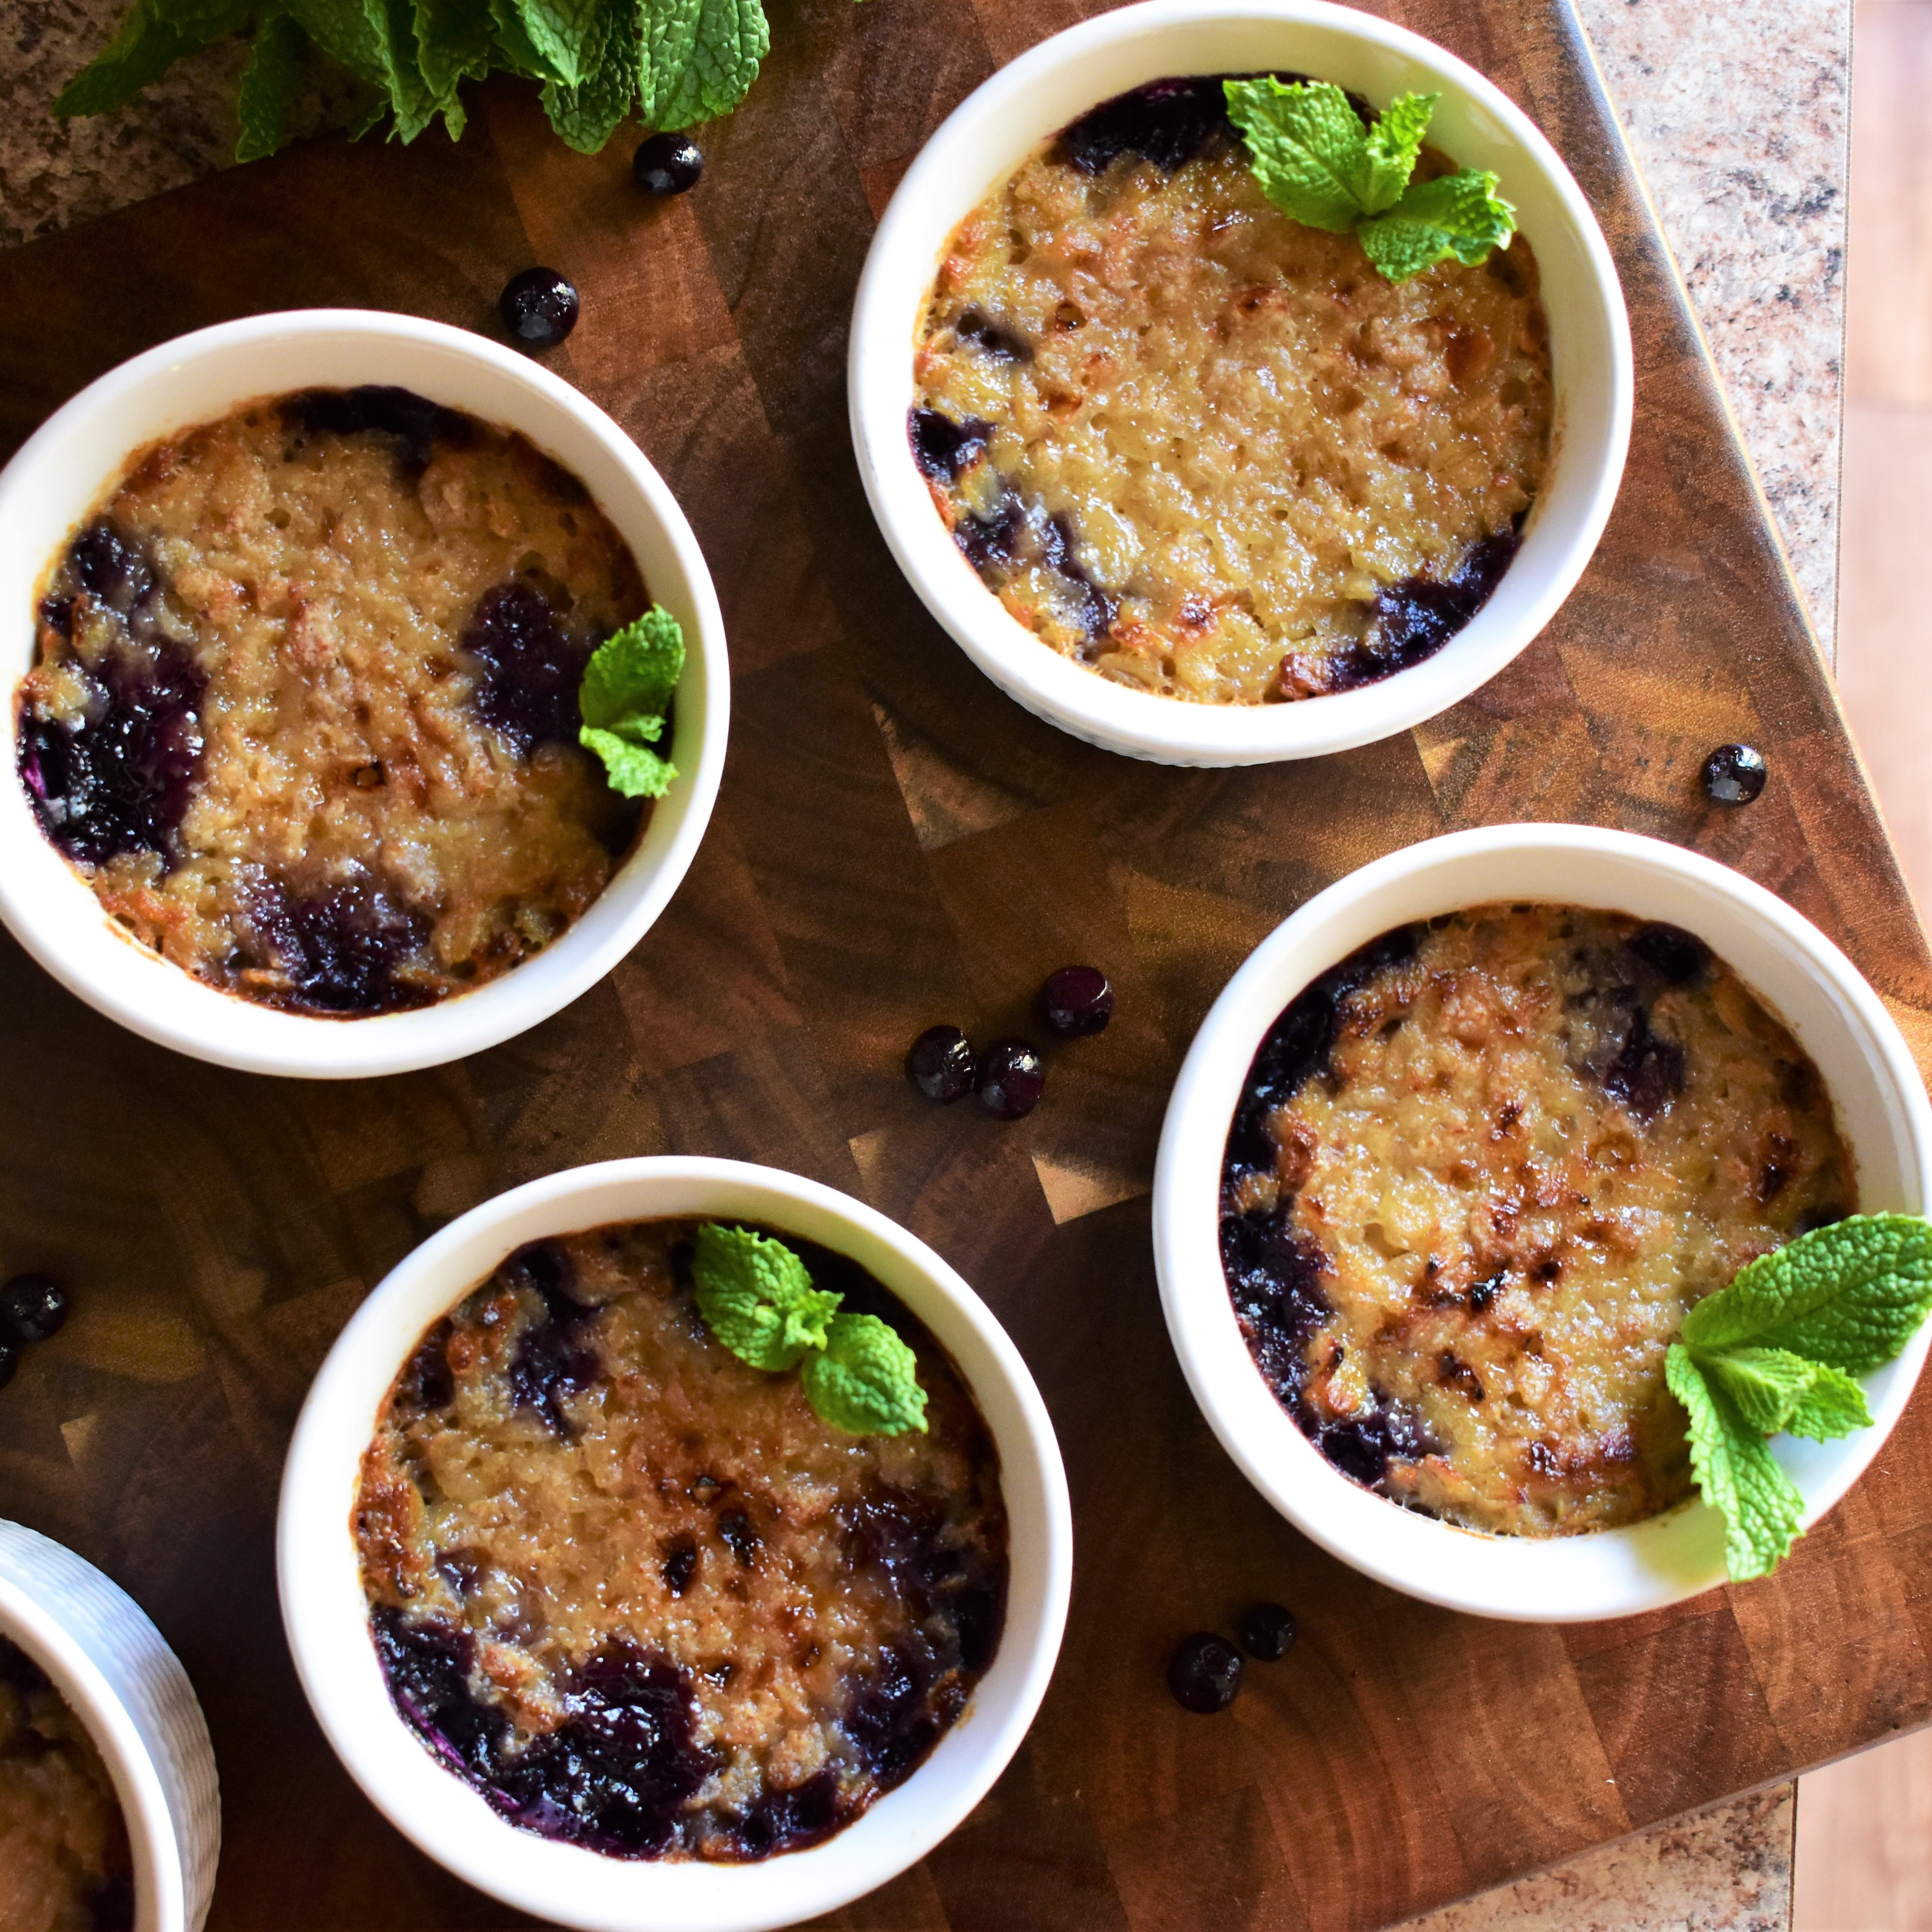 Blueberry Oatmeal Cream Brulee